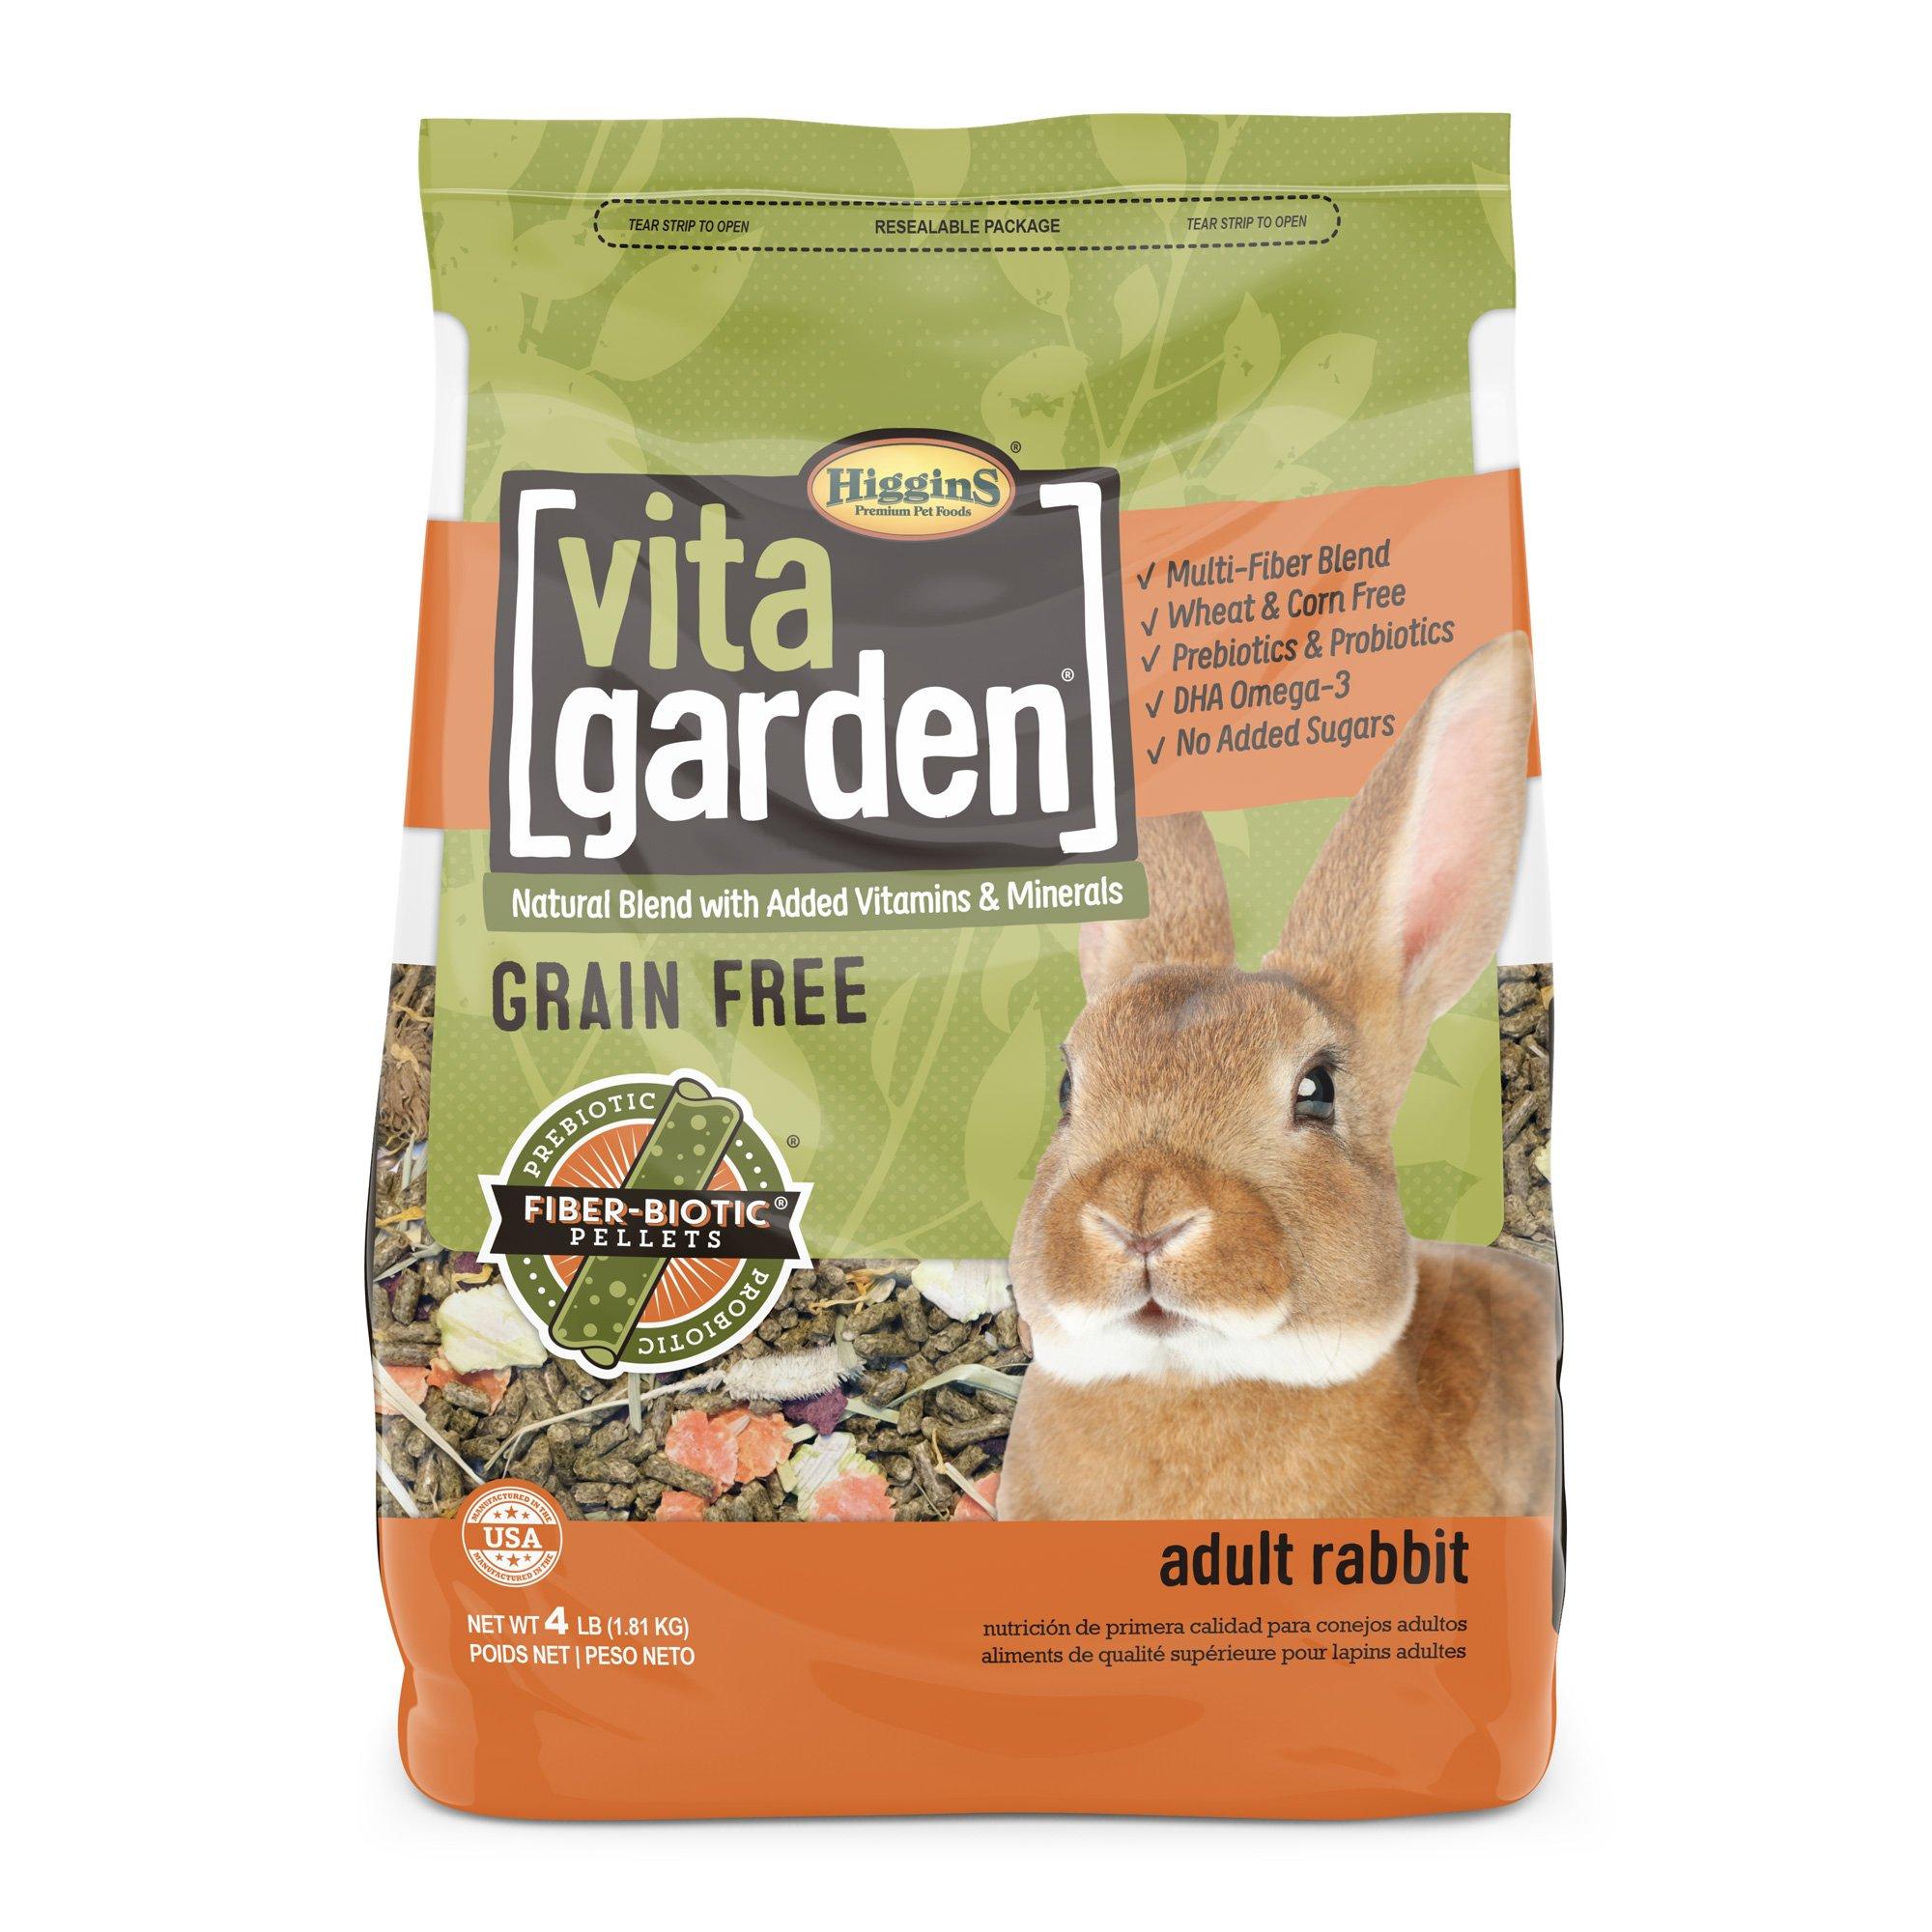 Higgins Vita Garden Rabbit Food